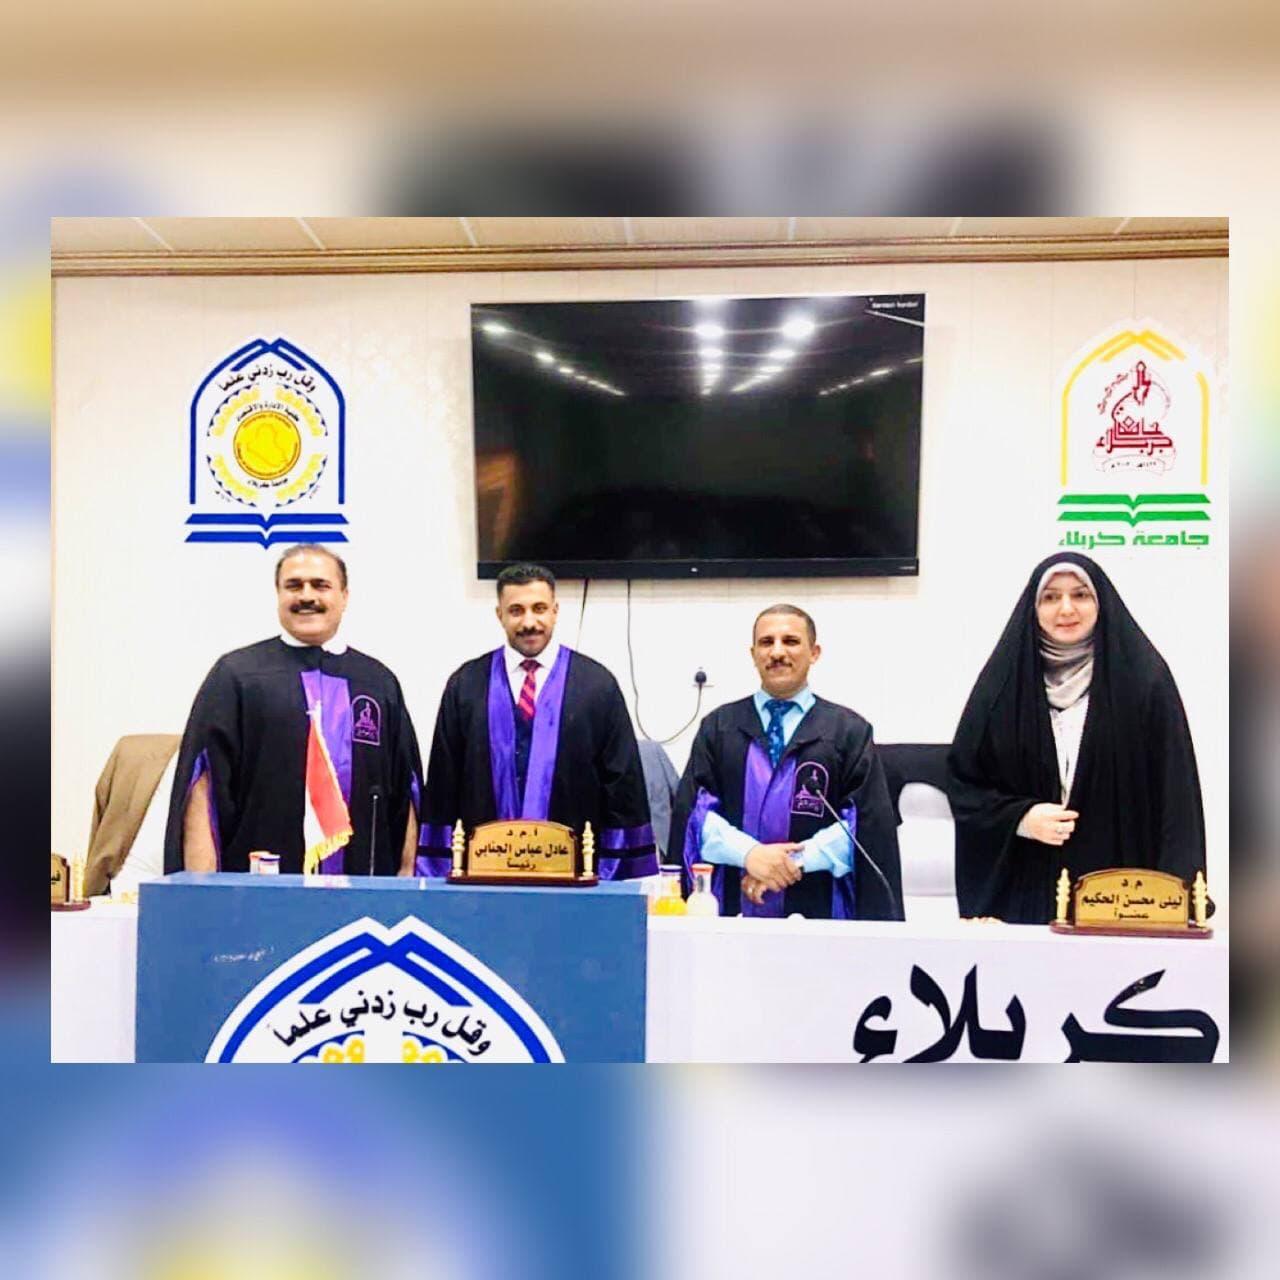 Read more about the article جامعة كربلاء تناقش بحث الدبلوم العالي حول إدارة المعرفة واثرها في جودة القرارات الاستراتيجية